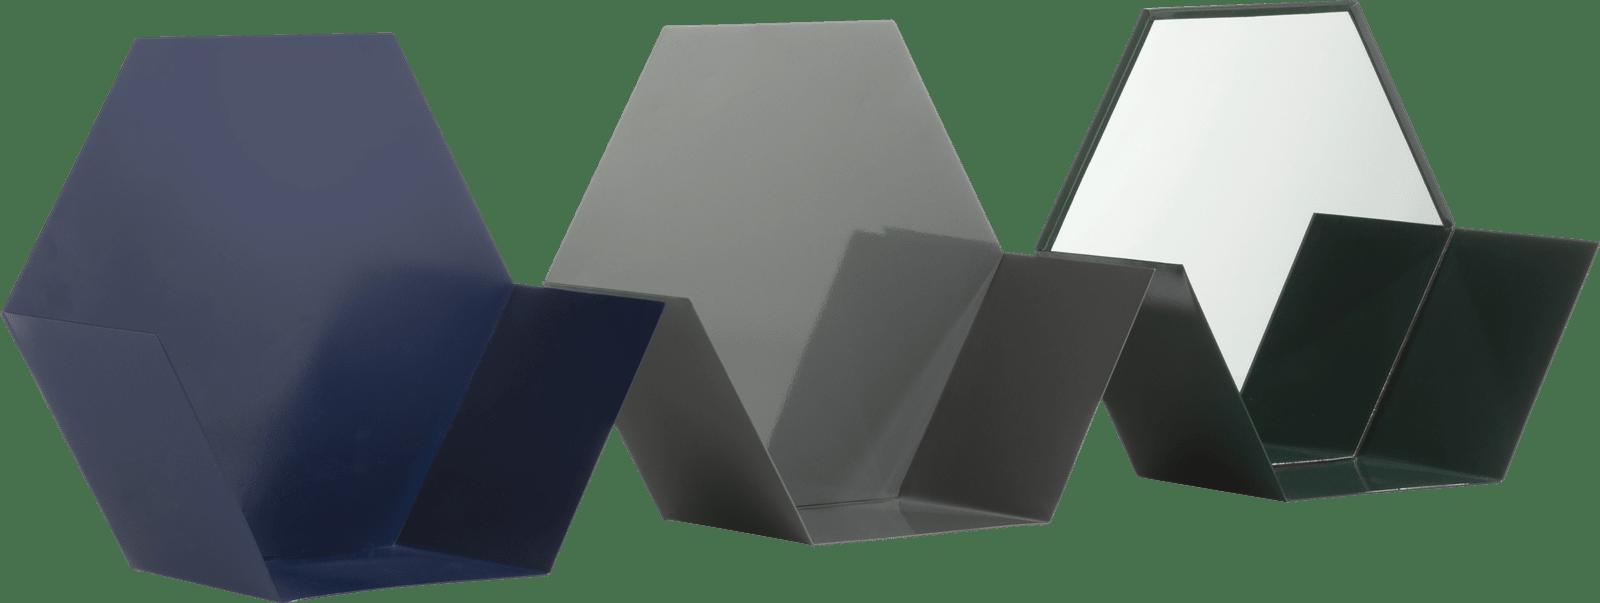 Coco Maison - 3 etageres hexa - multicouleur